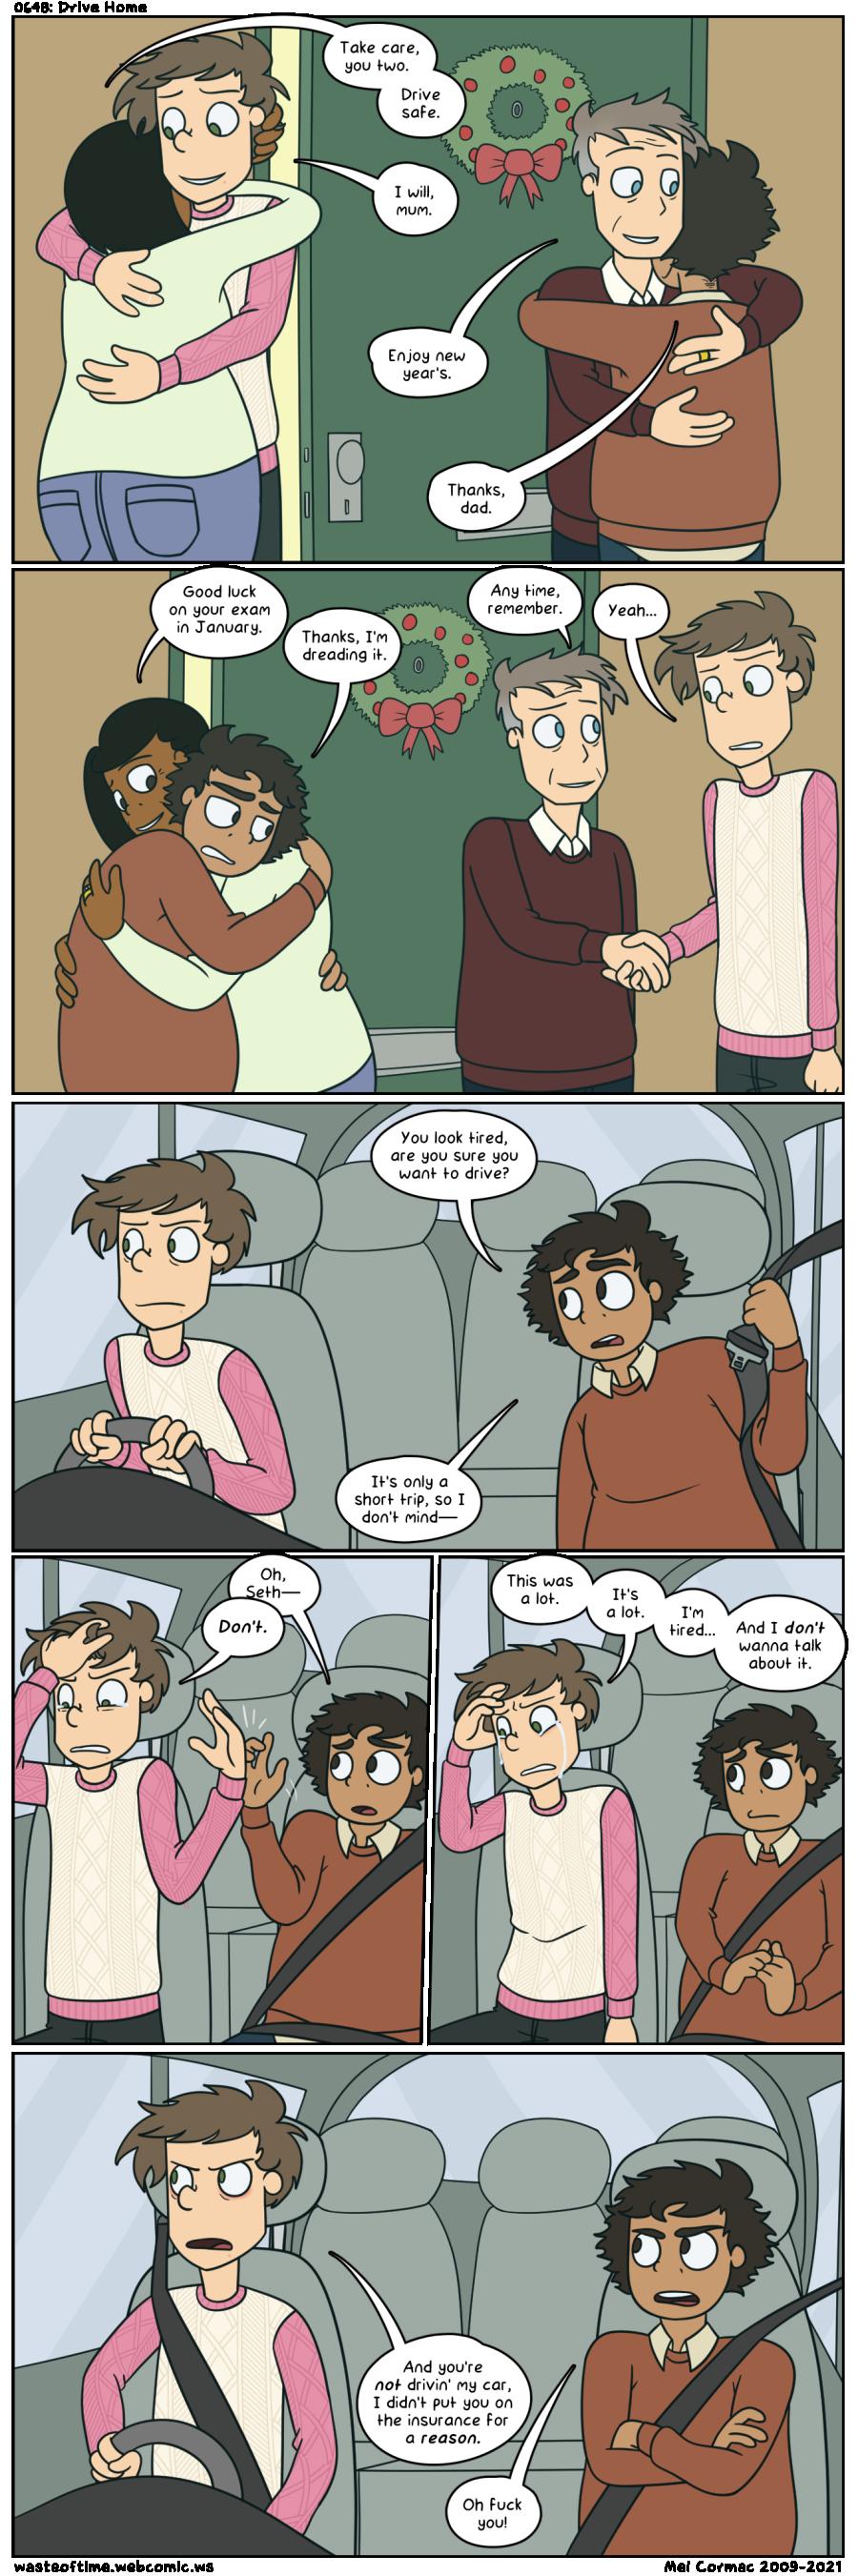 0648: Drive Home